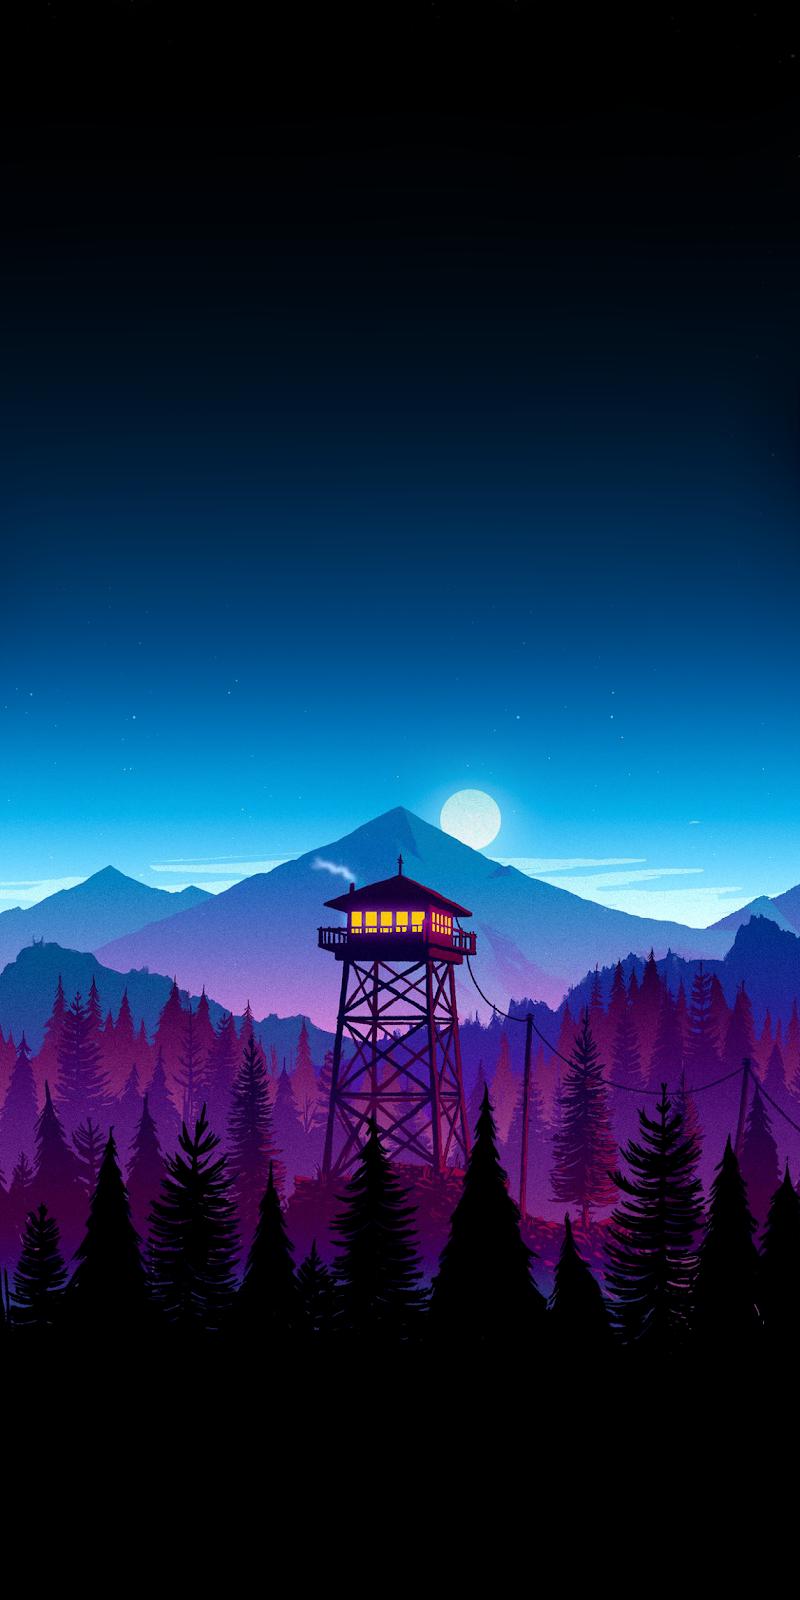 Download Top Beautiful Phone Wallpaper HD Today by bluewallpaperaesthetic.blogspot.se